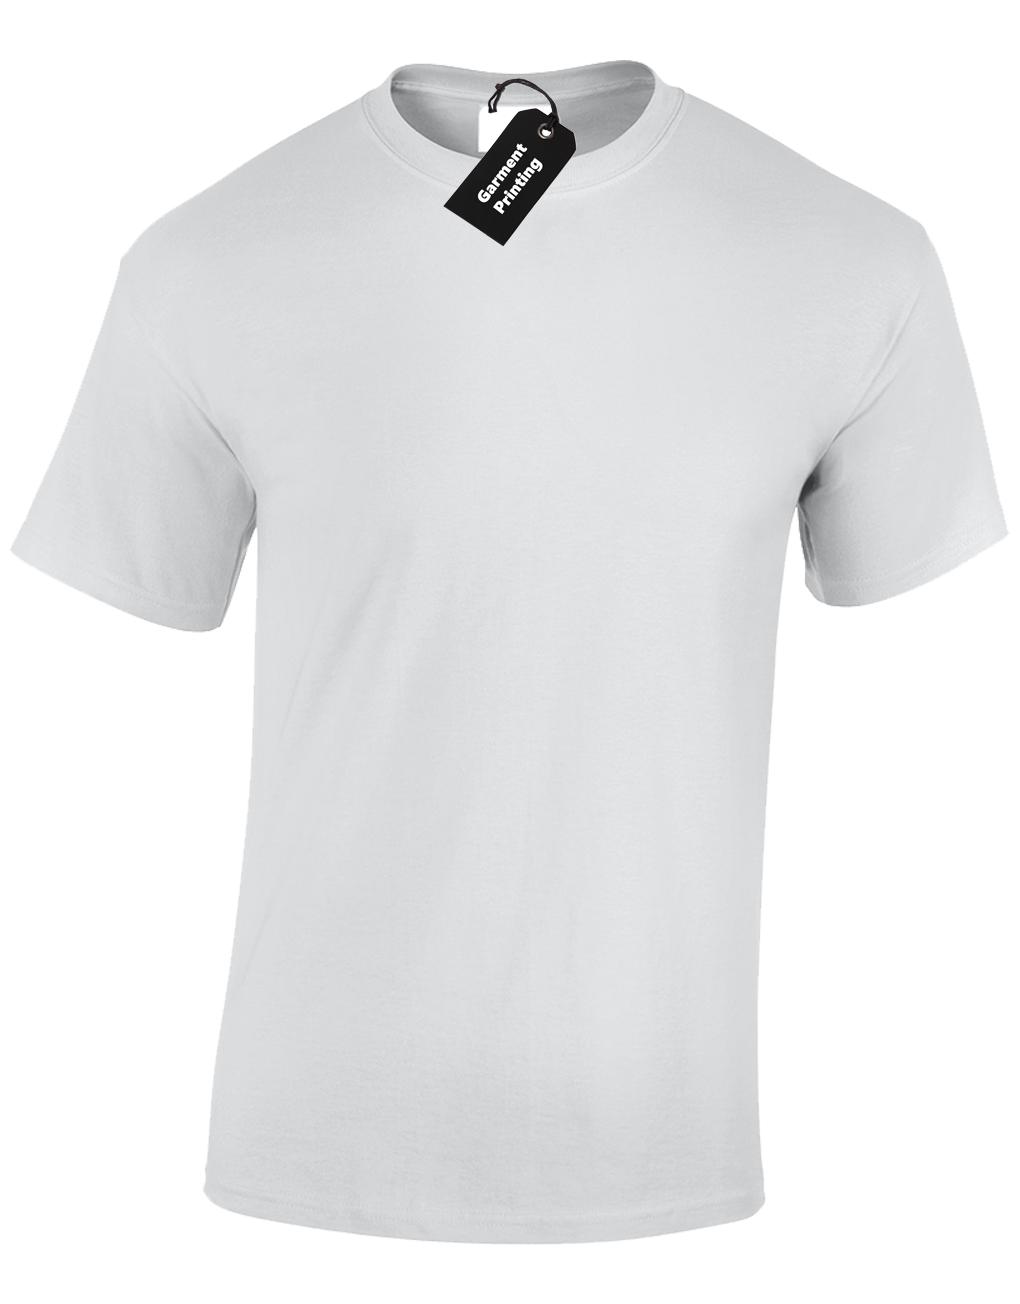 Mens Personalised Printed T-Shirt Unisex Custom Design Logo Uniform Stag Do Fun 9